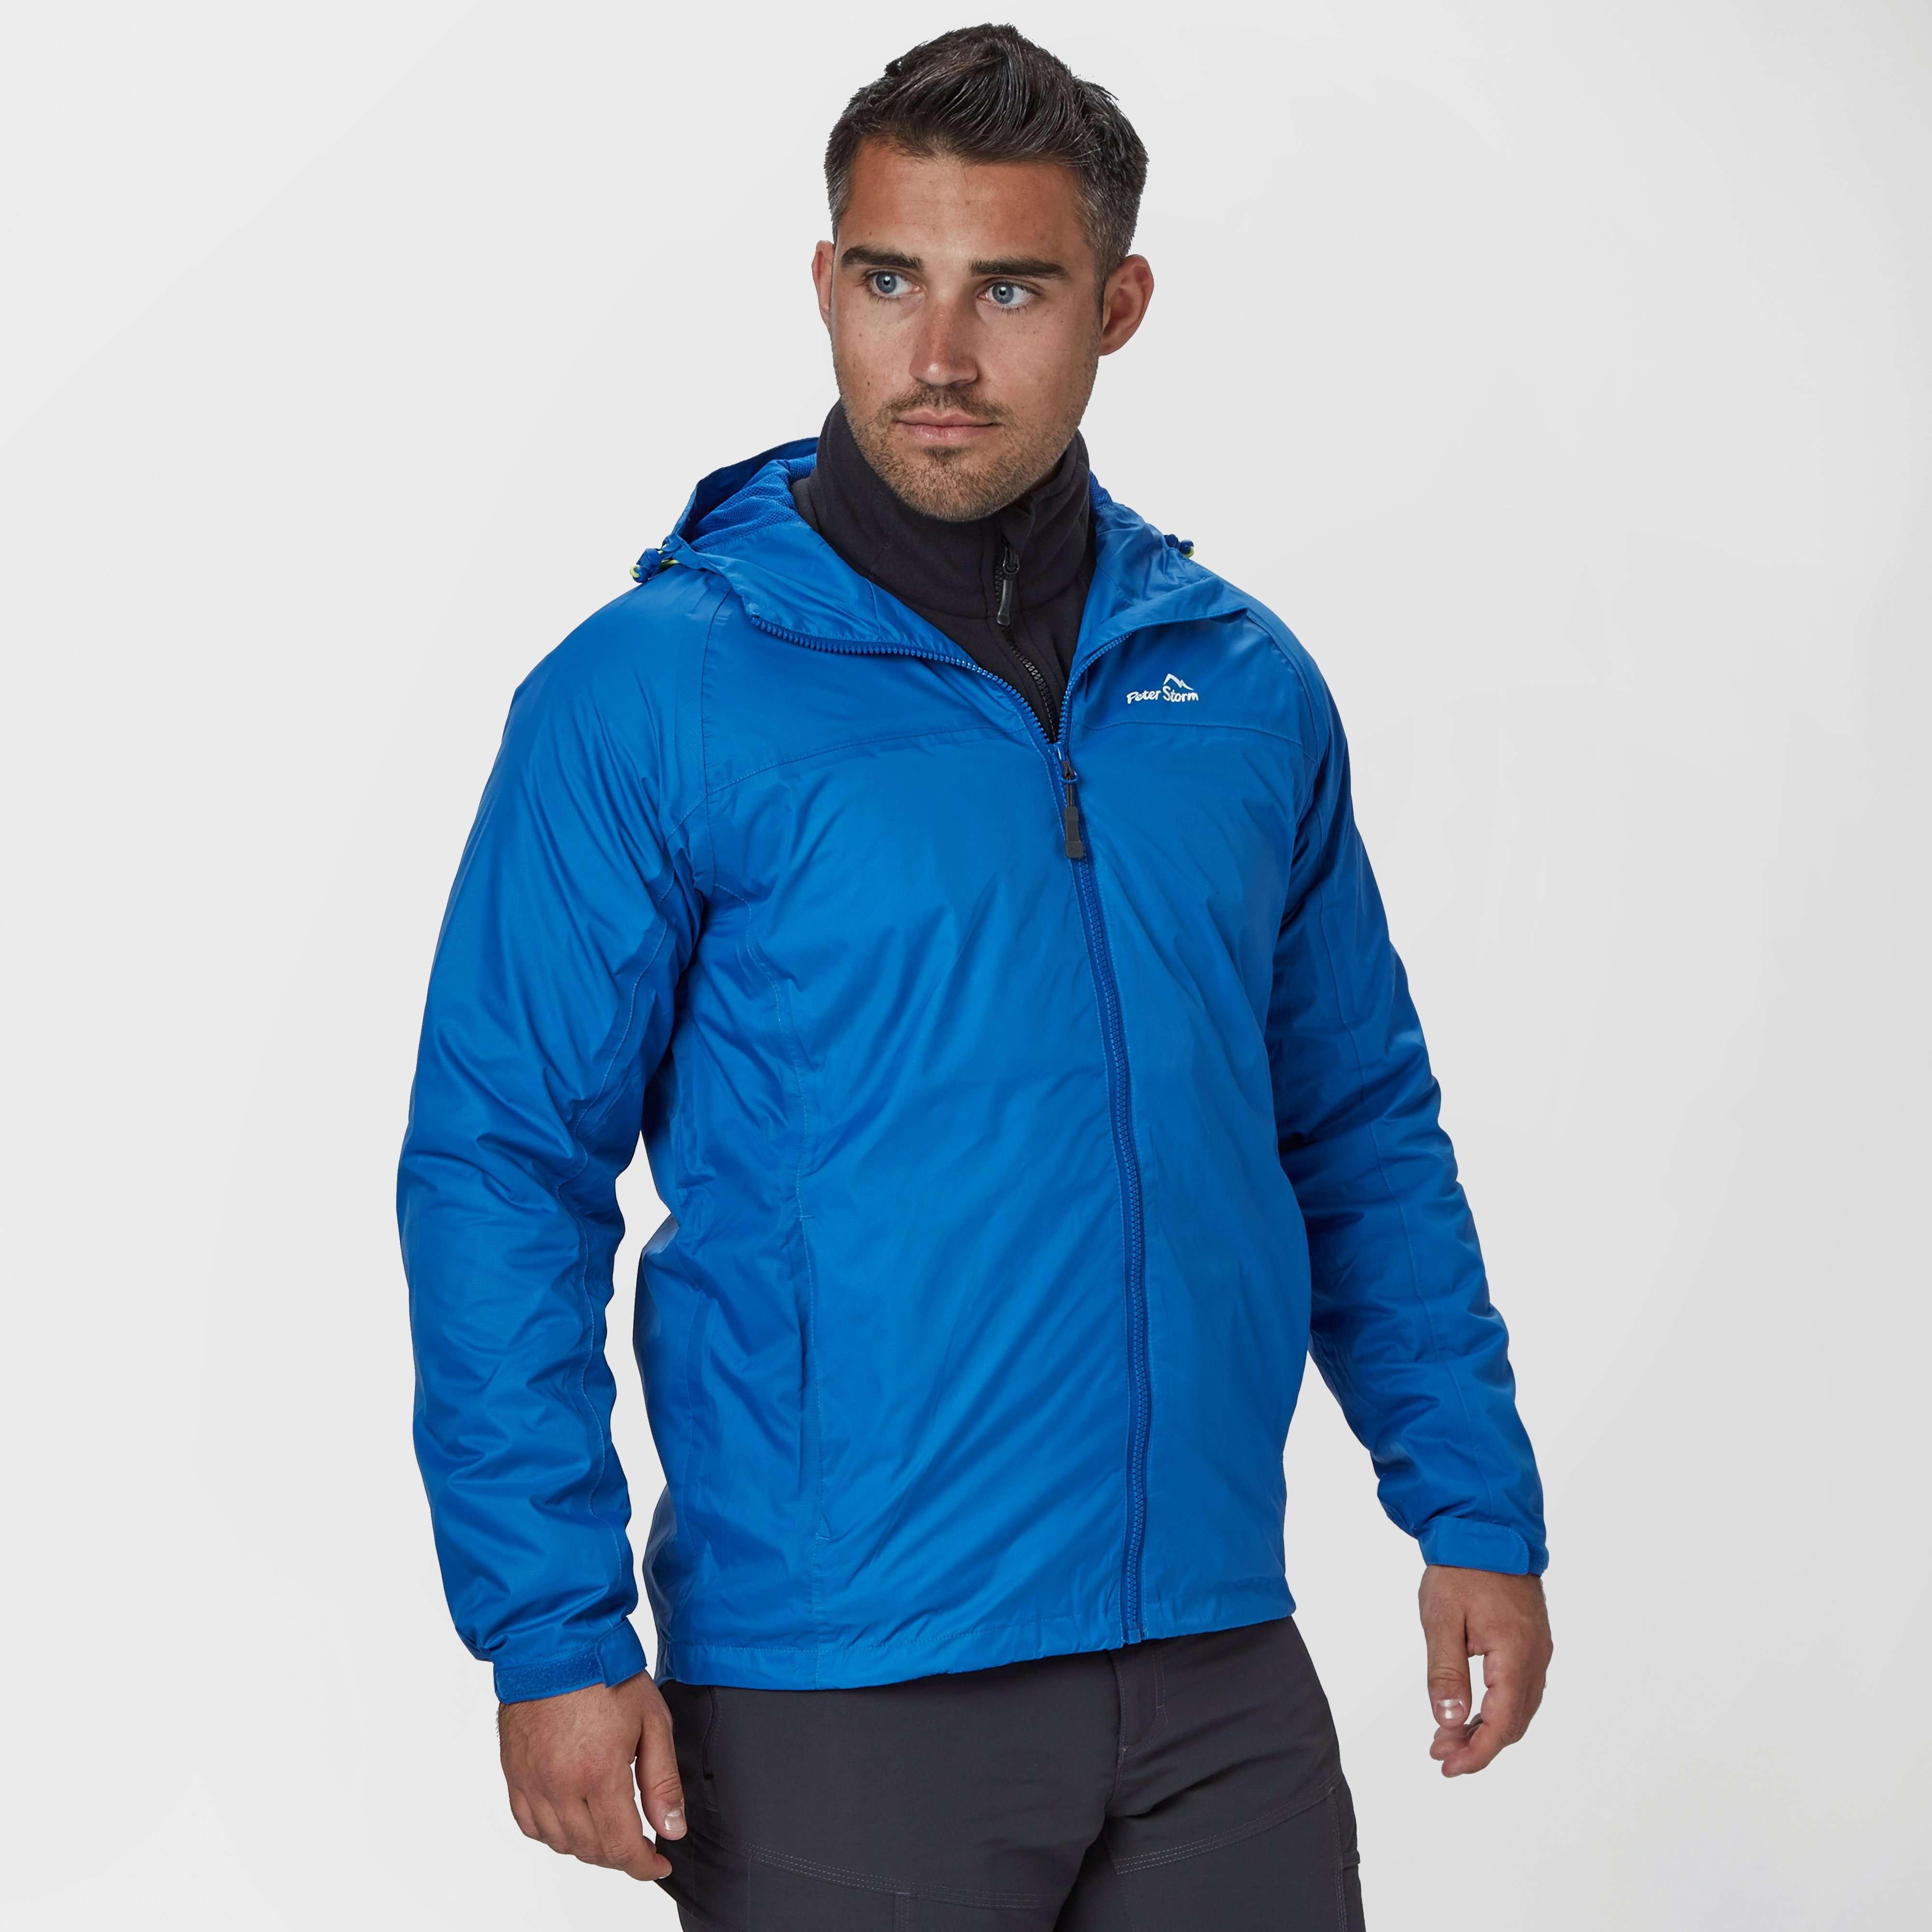 PETER STORM Men's Techlite Waterproof Jacket